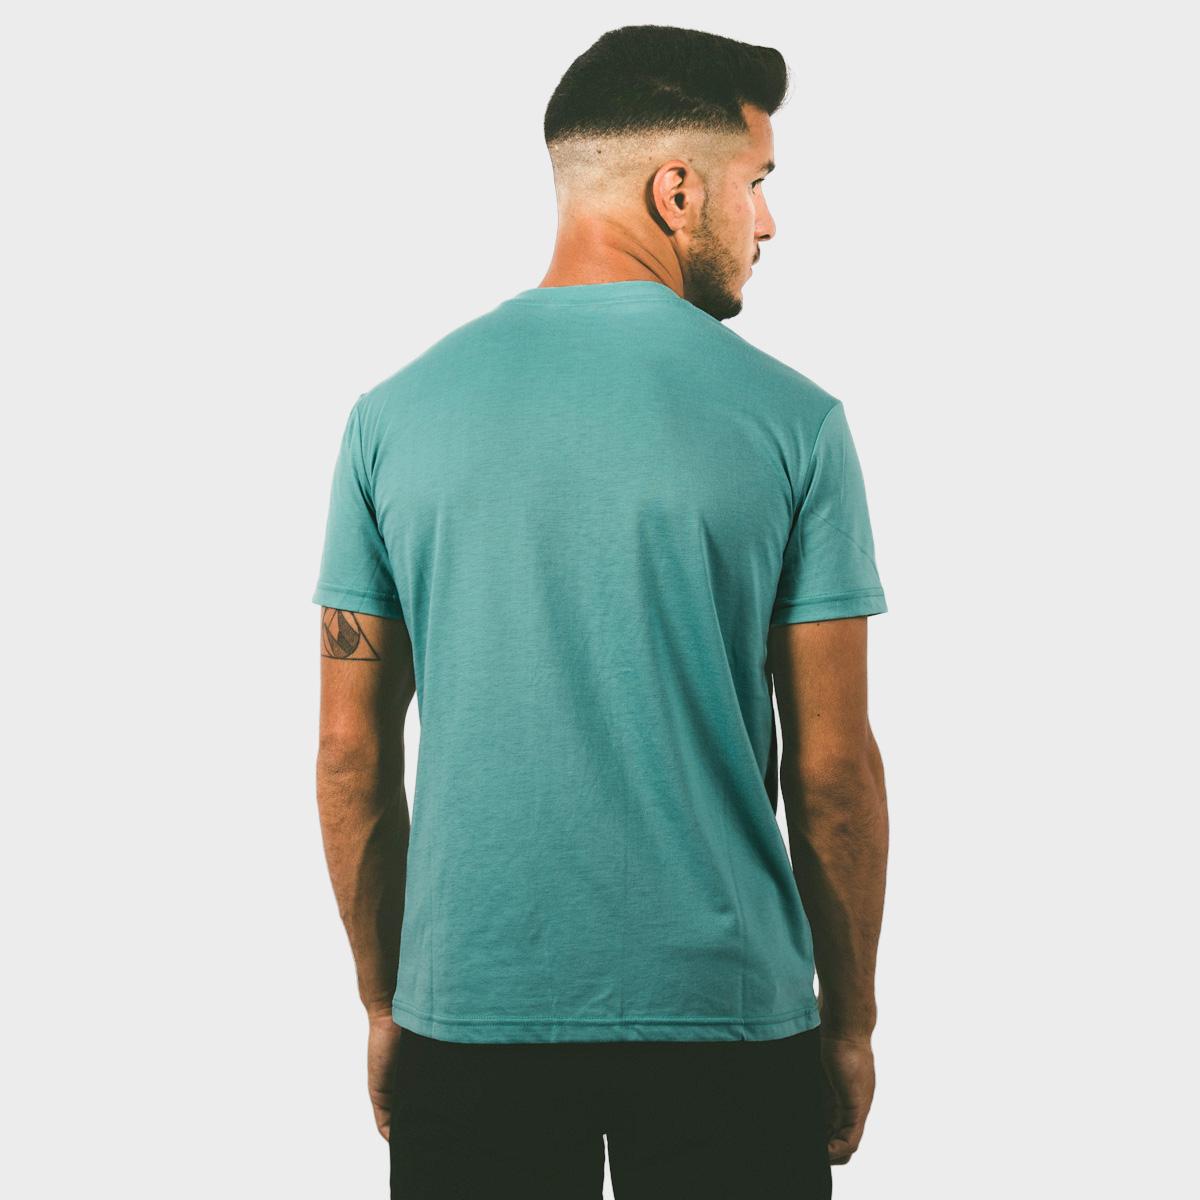 MAN'S KANSAS T-SHIRT GREEN